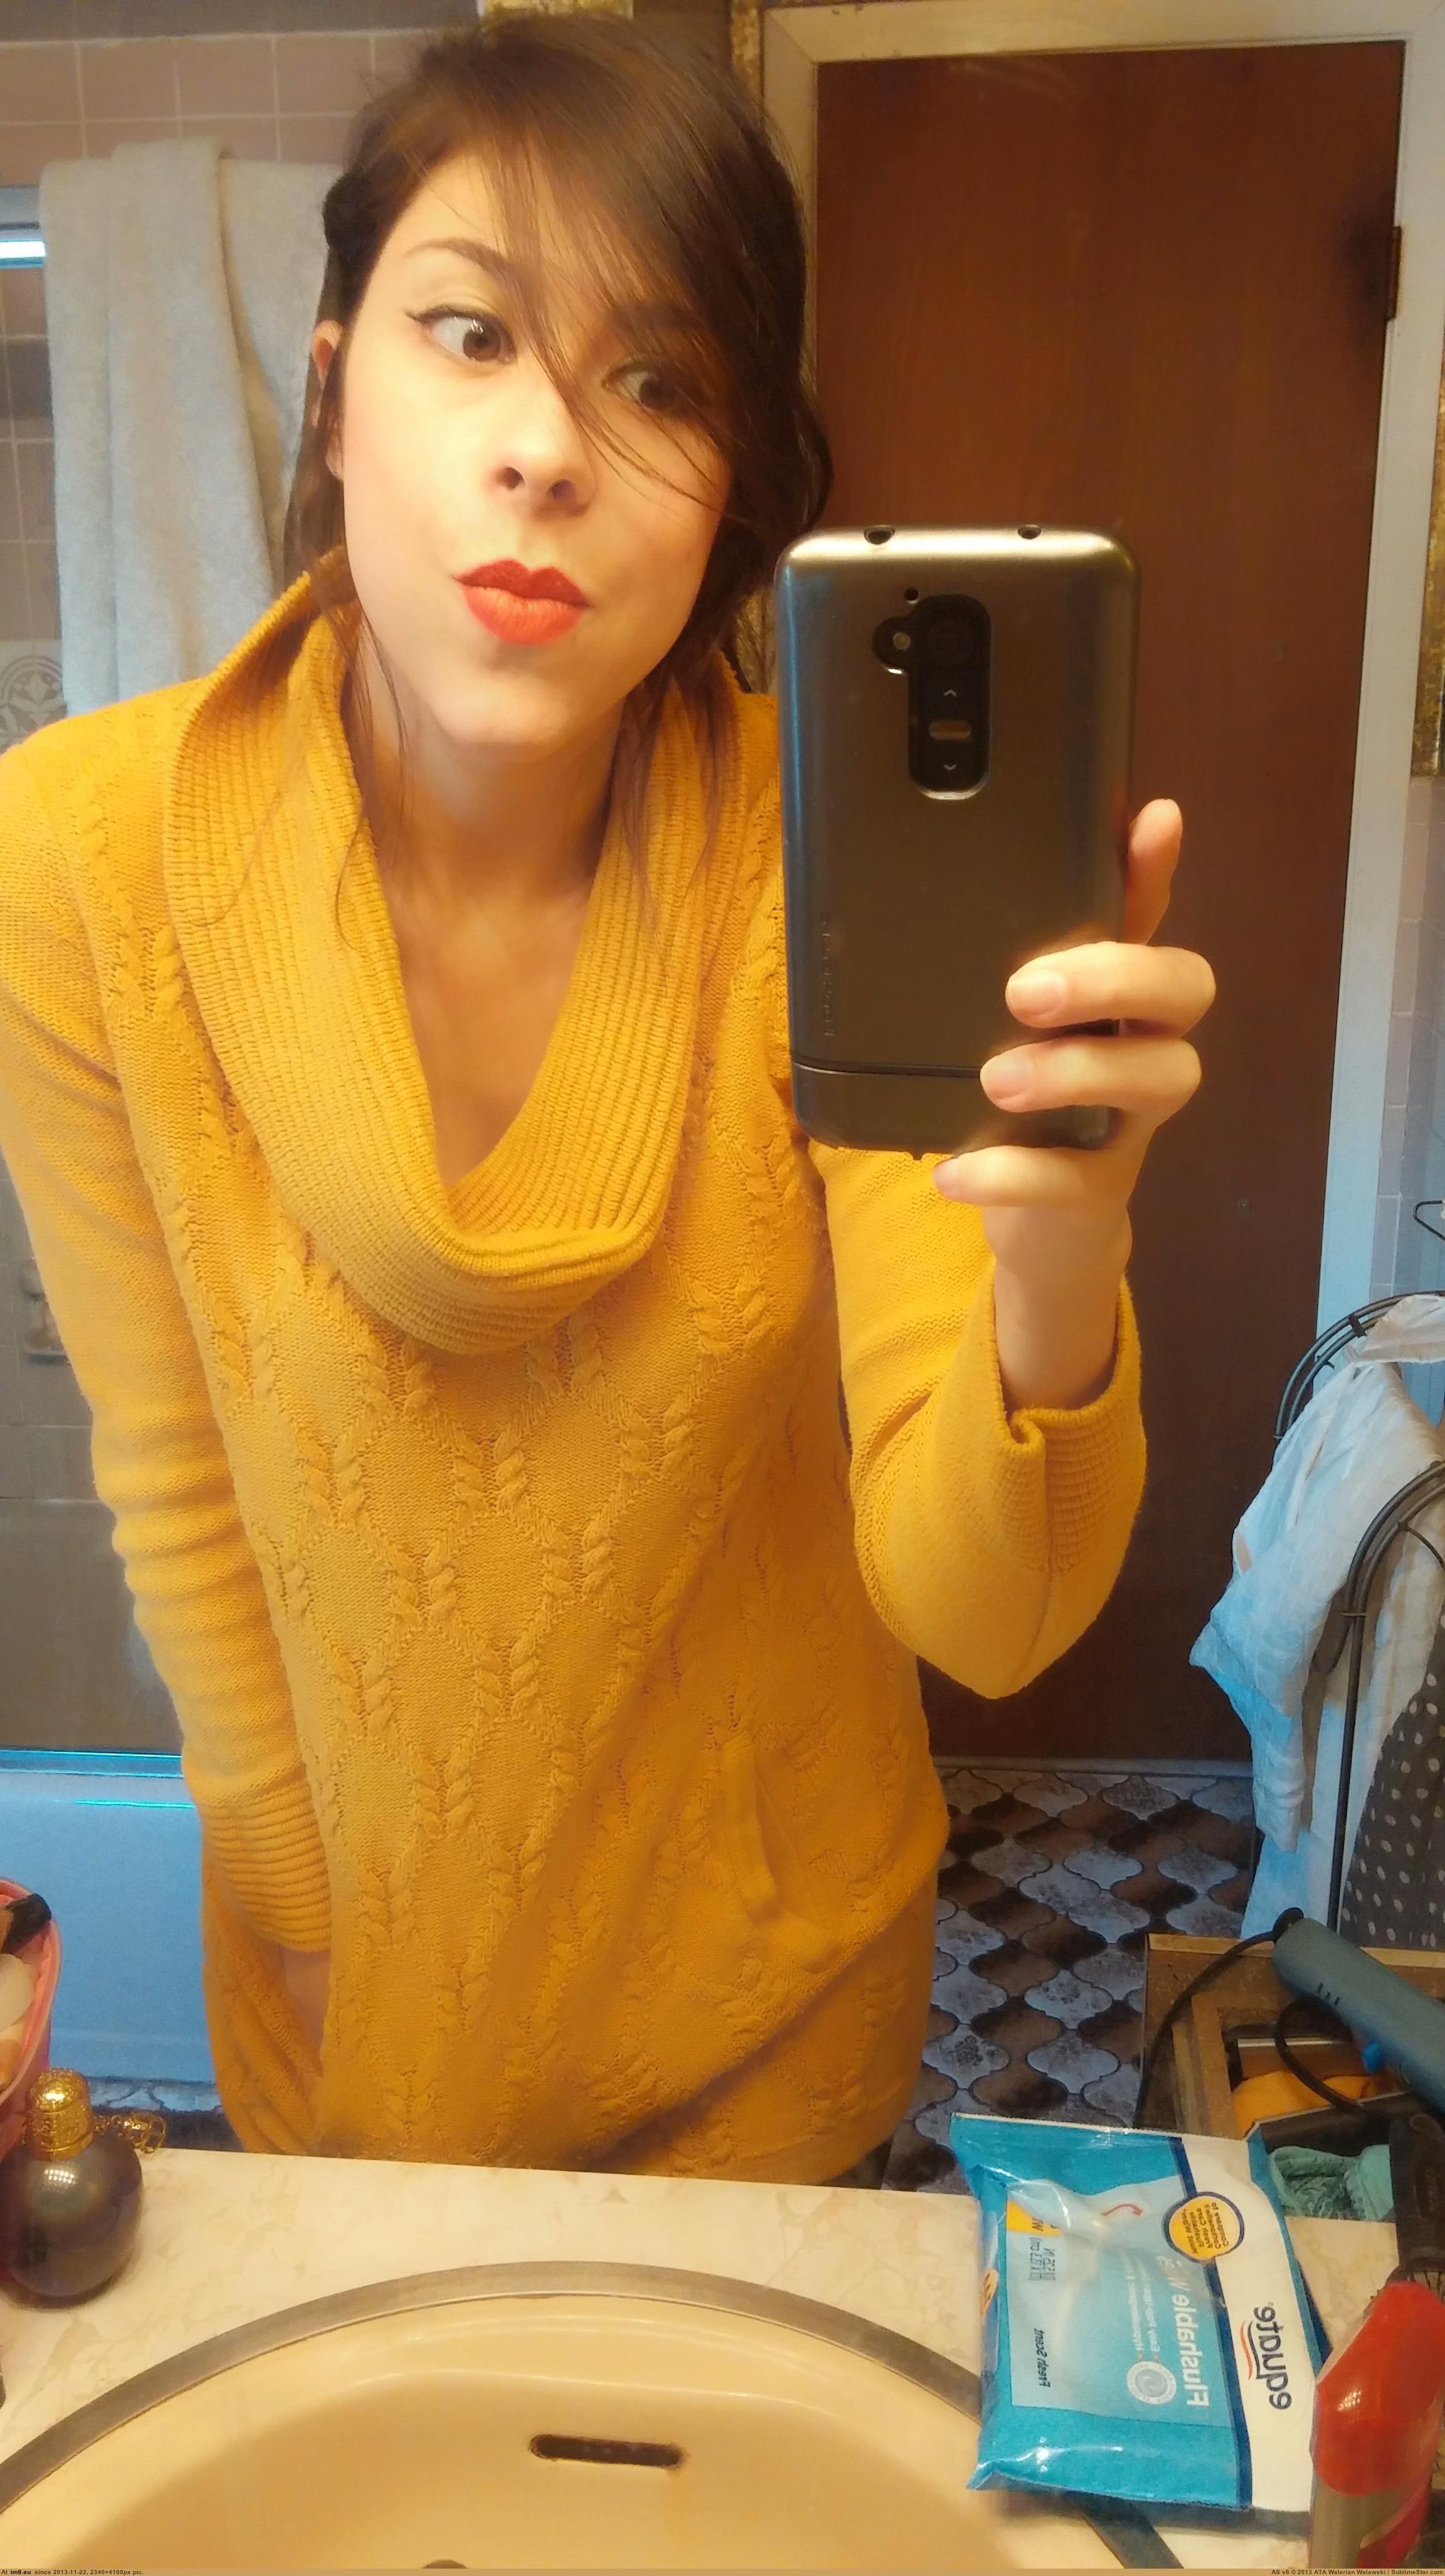 amateur-girl-boobs-selfshot-in-mirror-nude-05